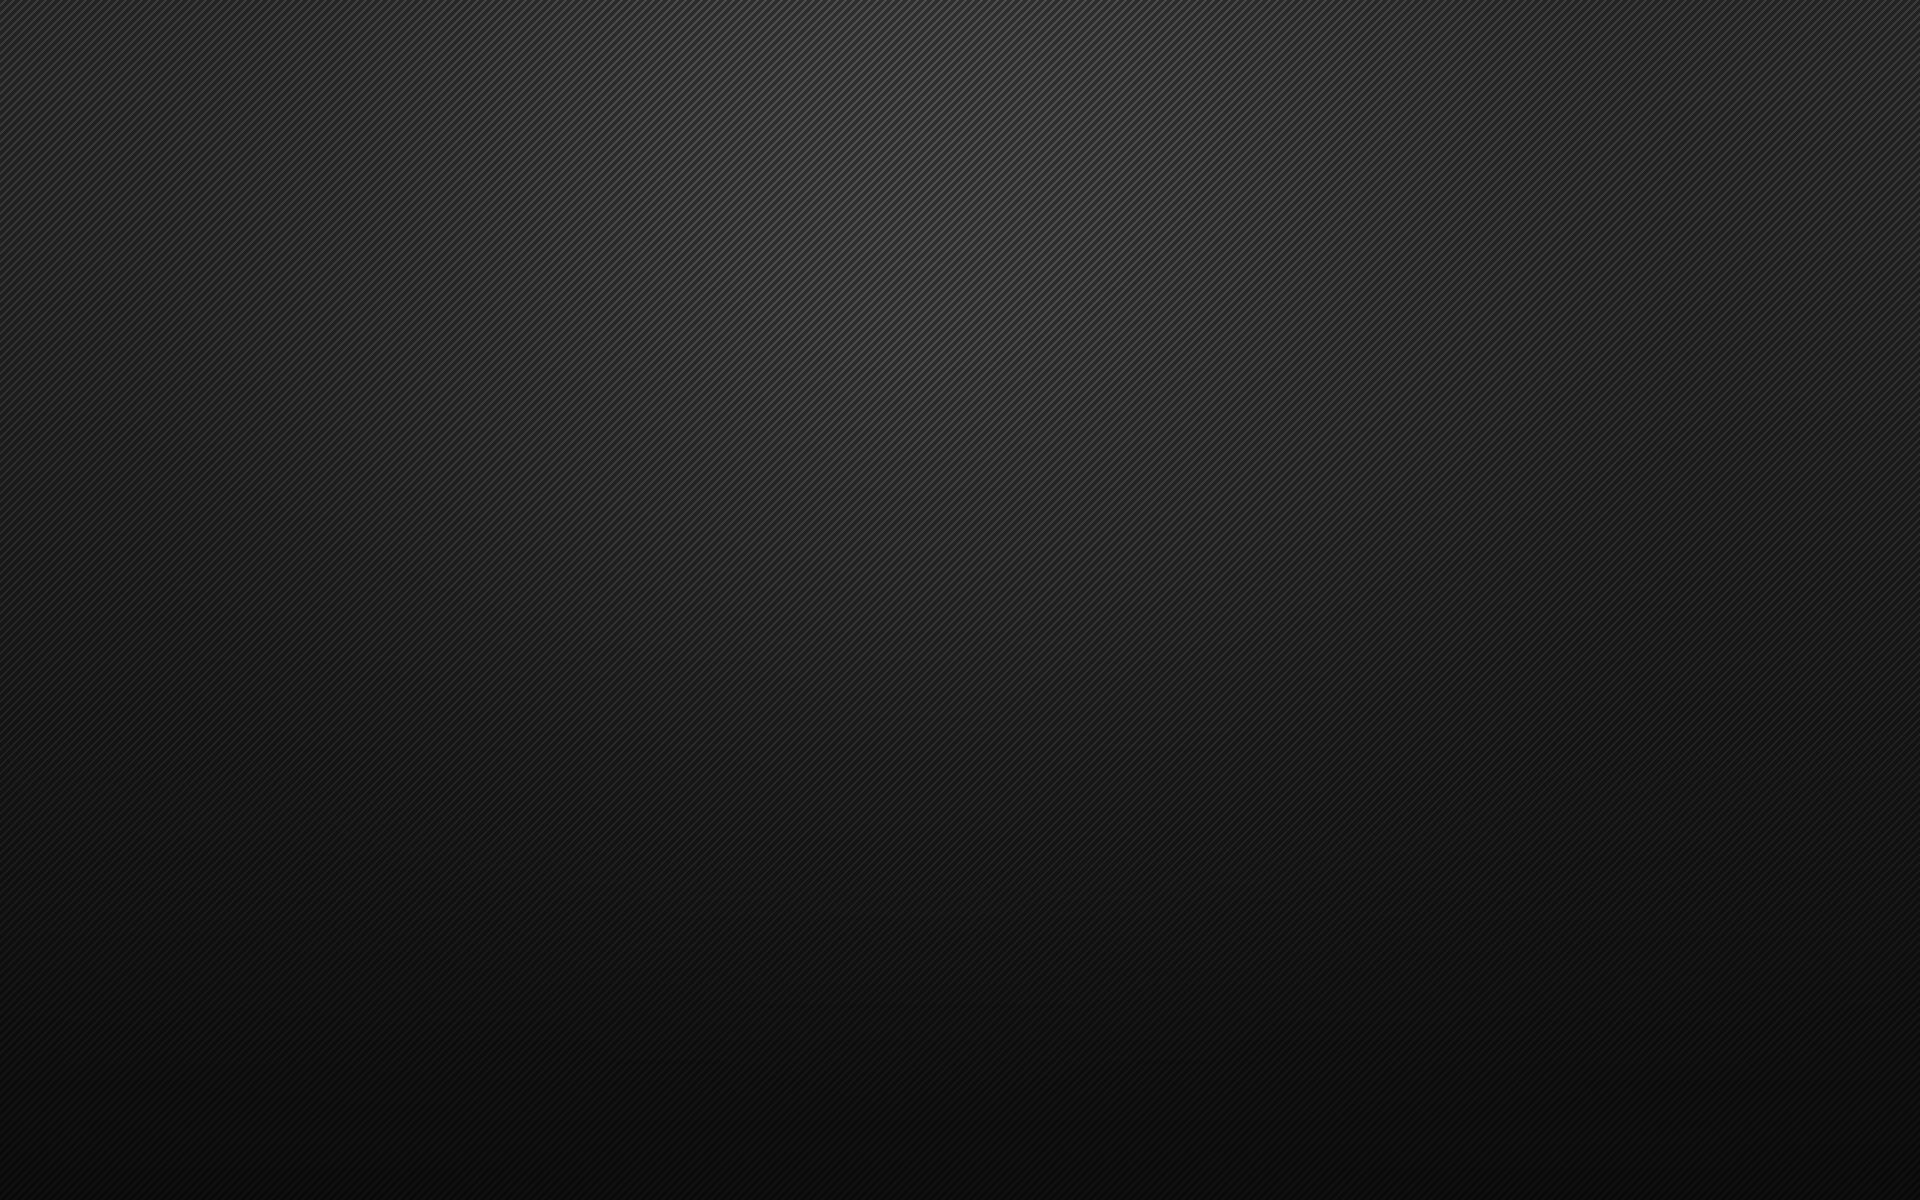 Plain Black Desktop Wallpaper